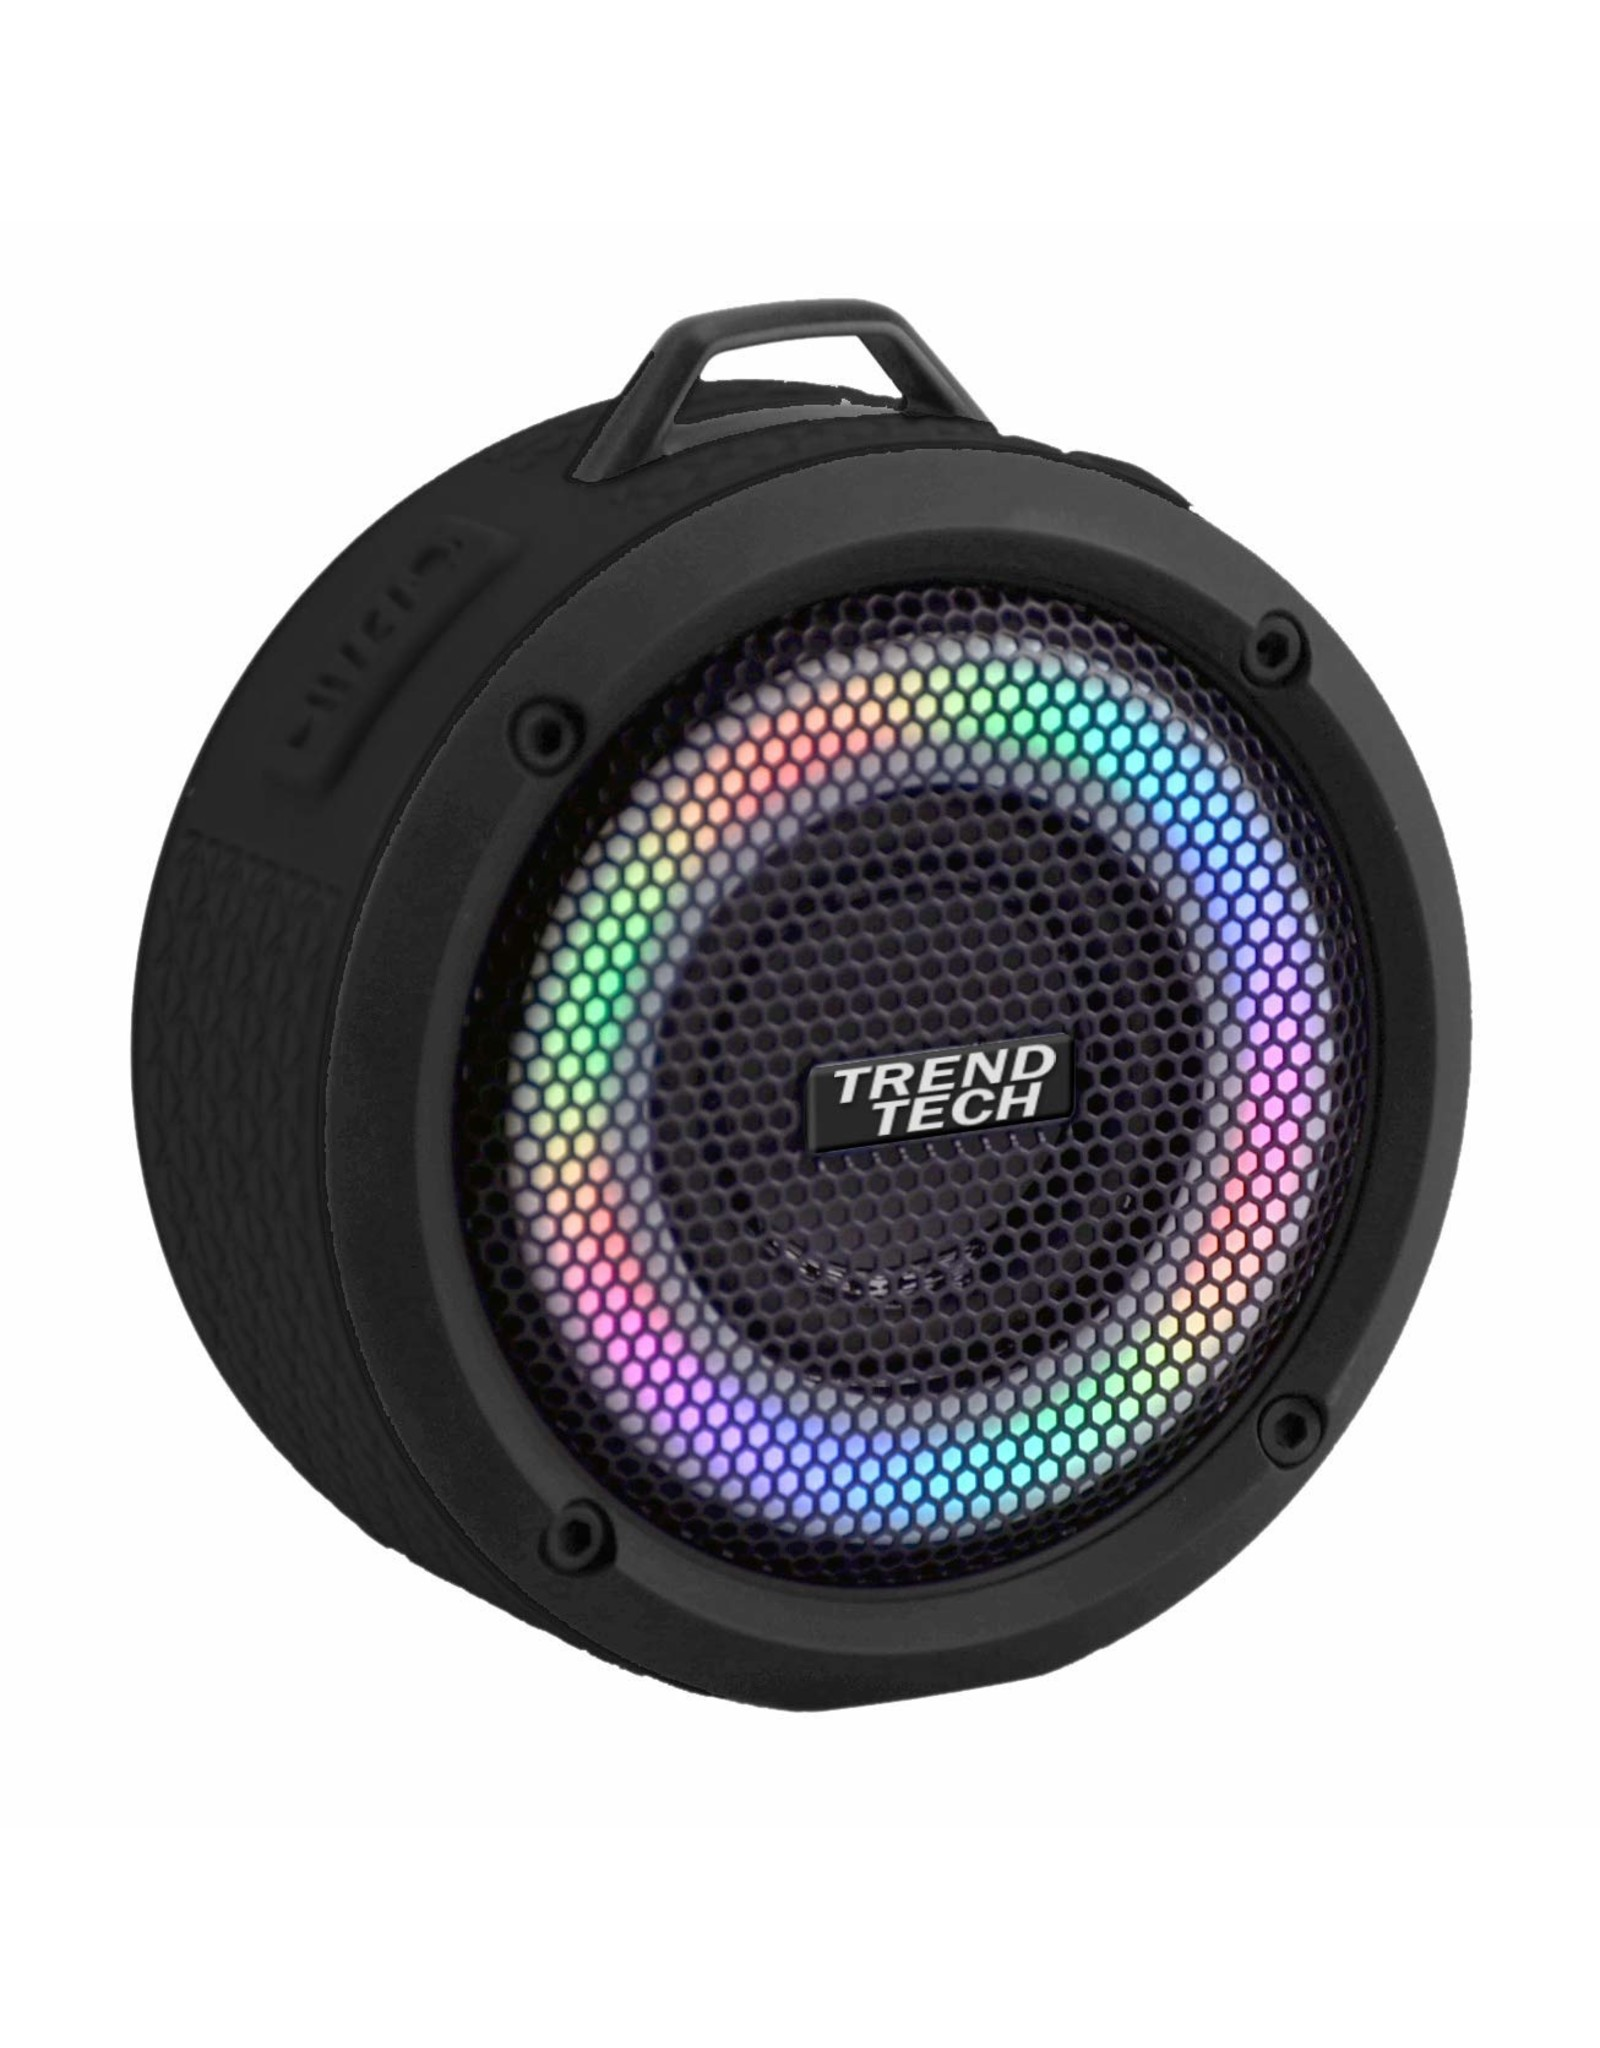 Dorm Blaster Waterproof Speaker